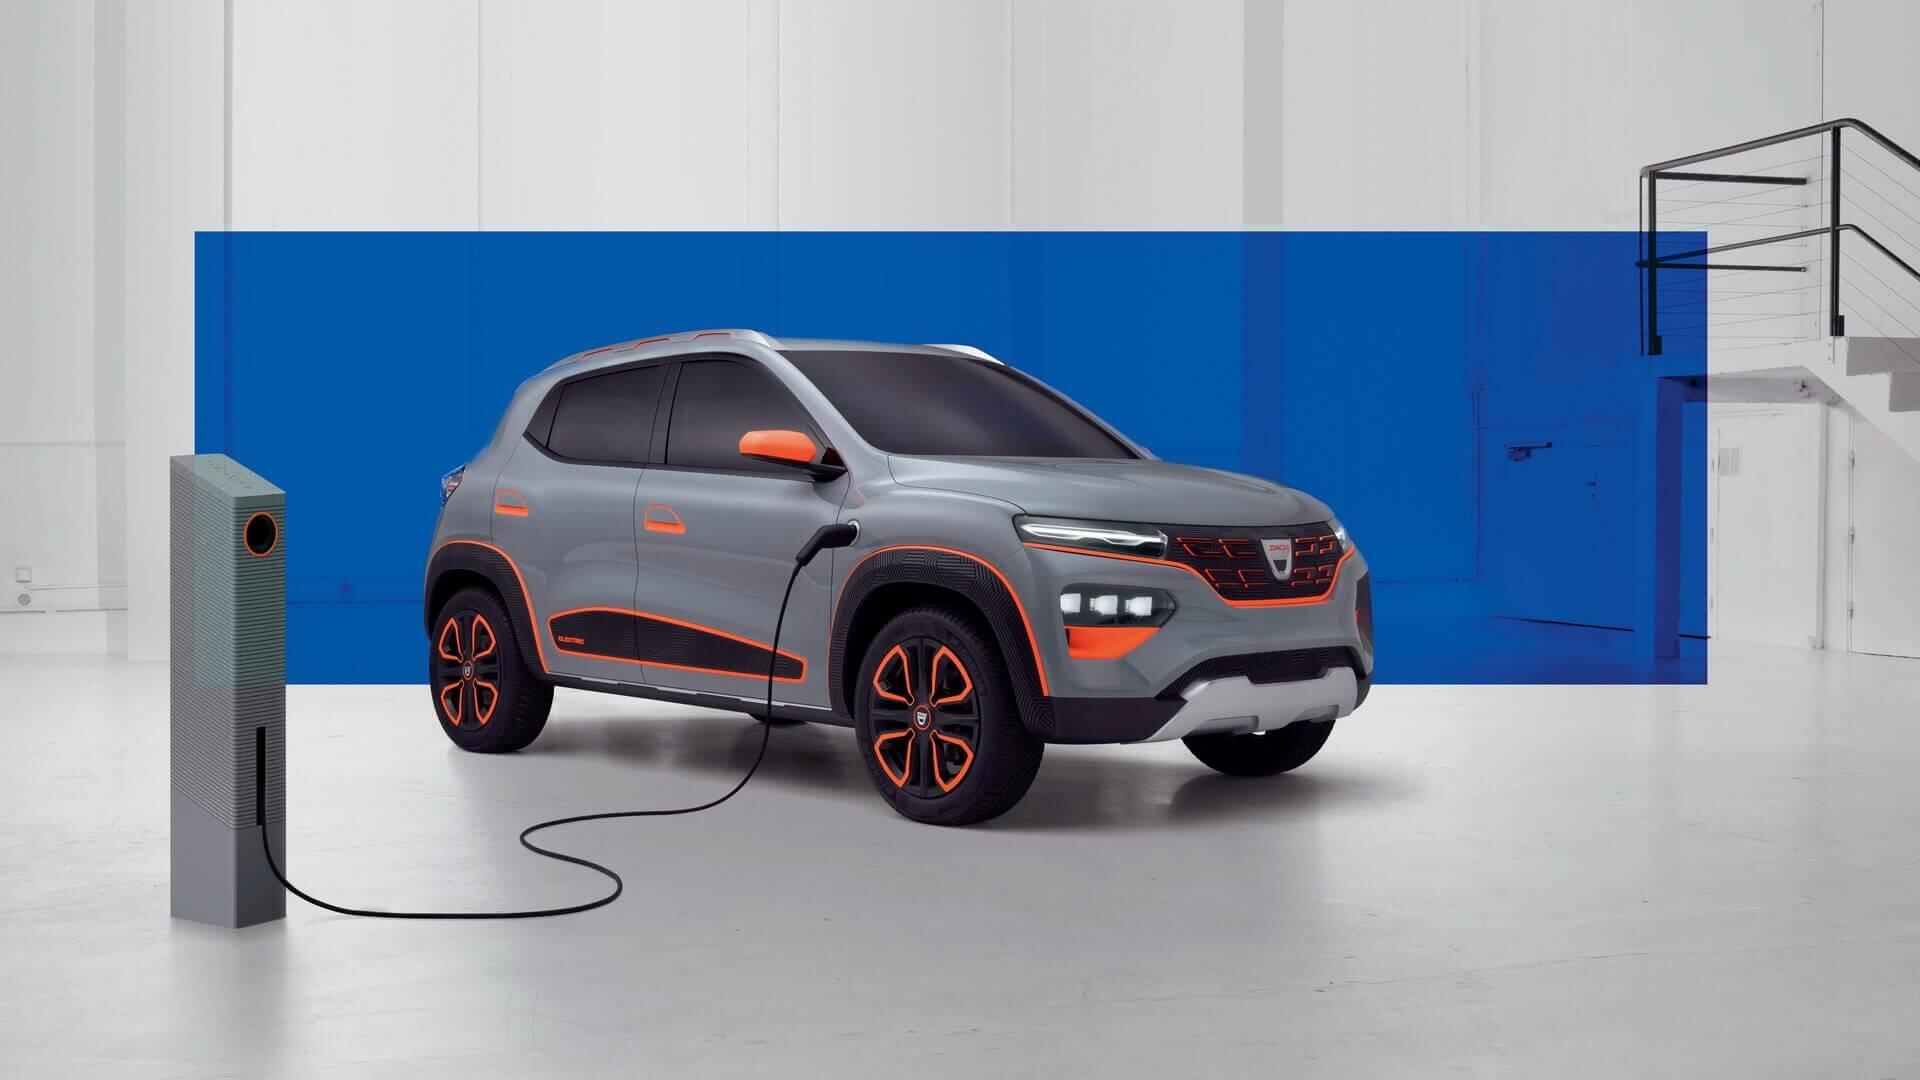 Бюджетный электрокар от Renault с запасом хода 200 км